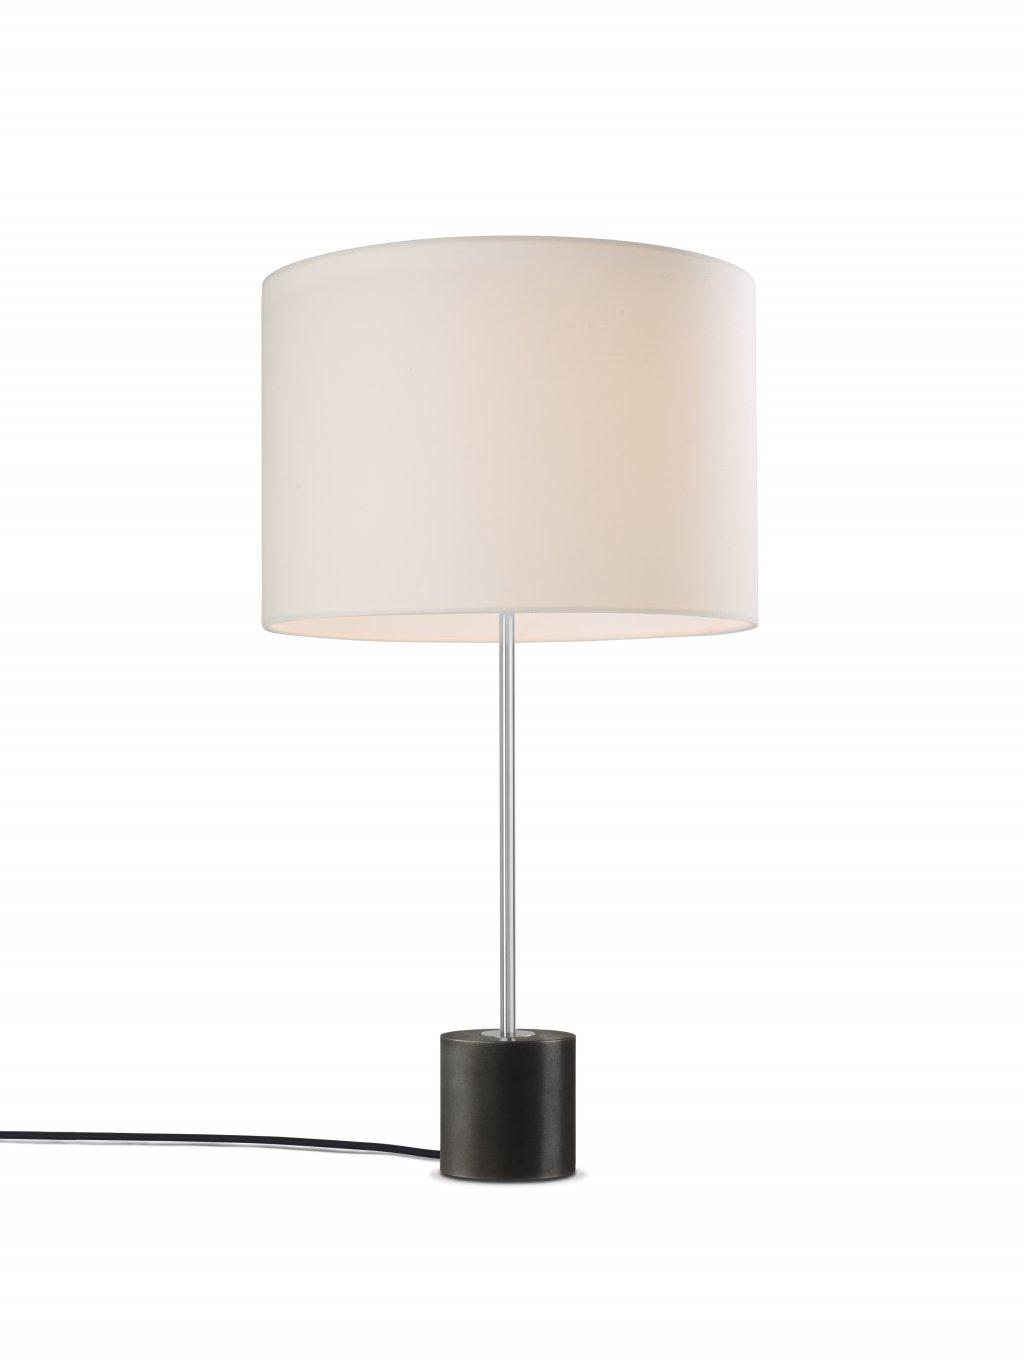 Kilo Table Lamp, 1959